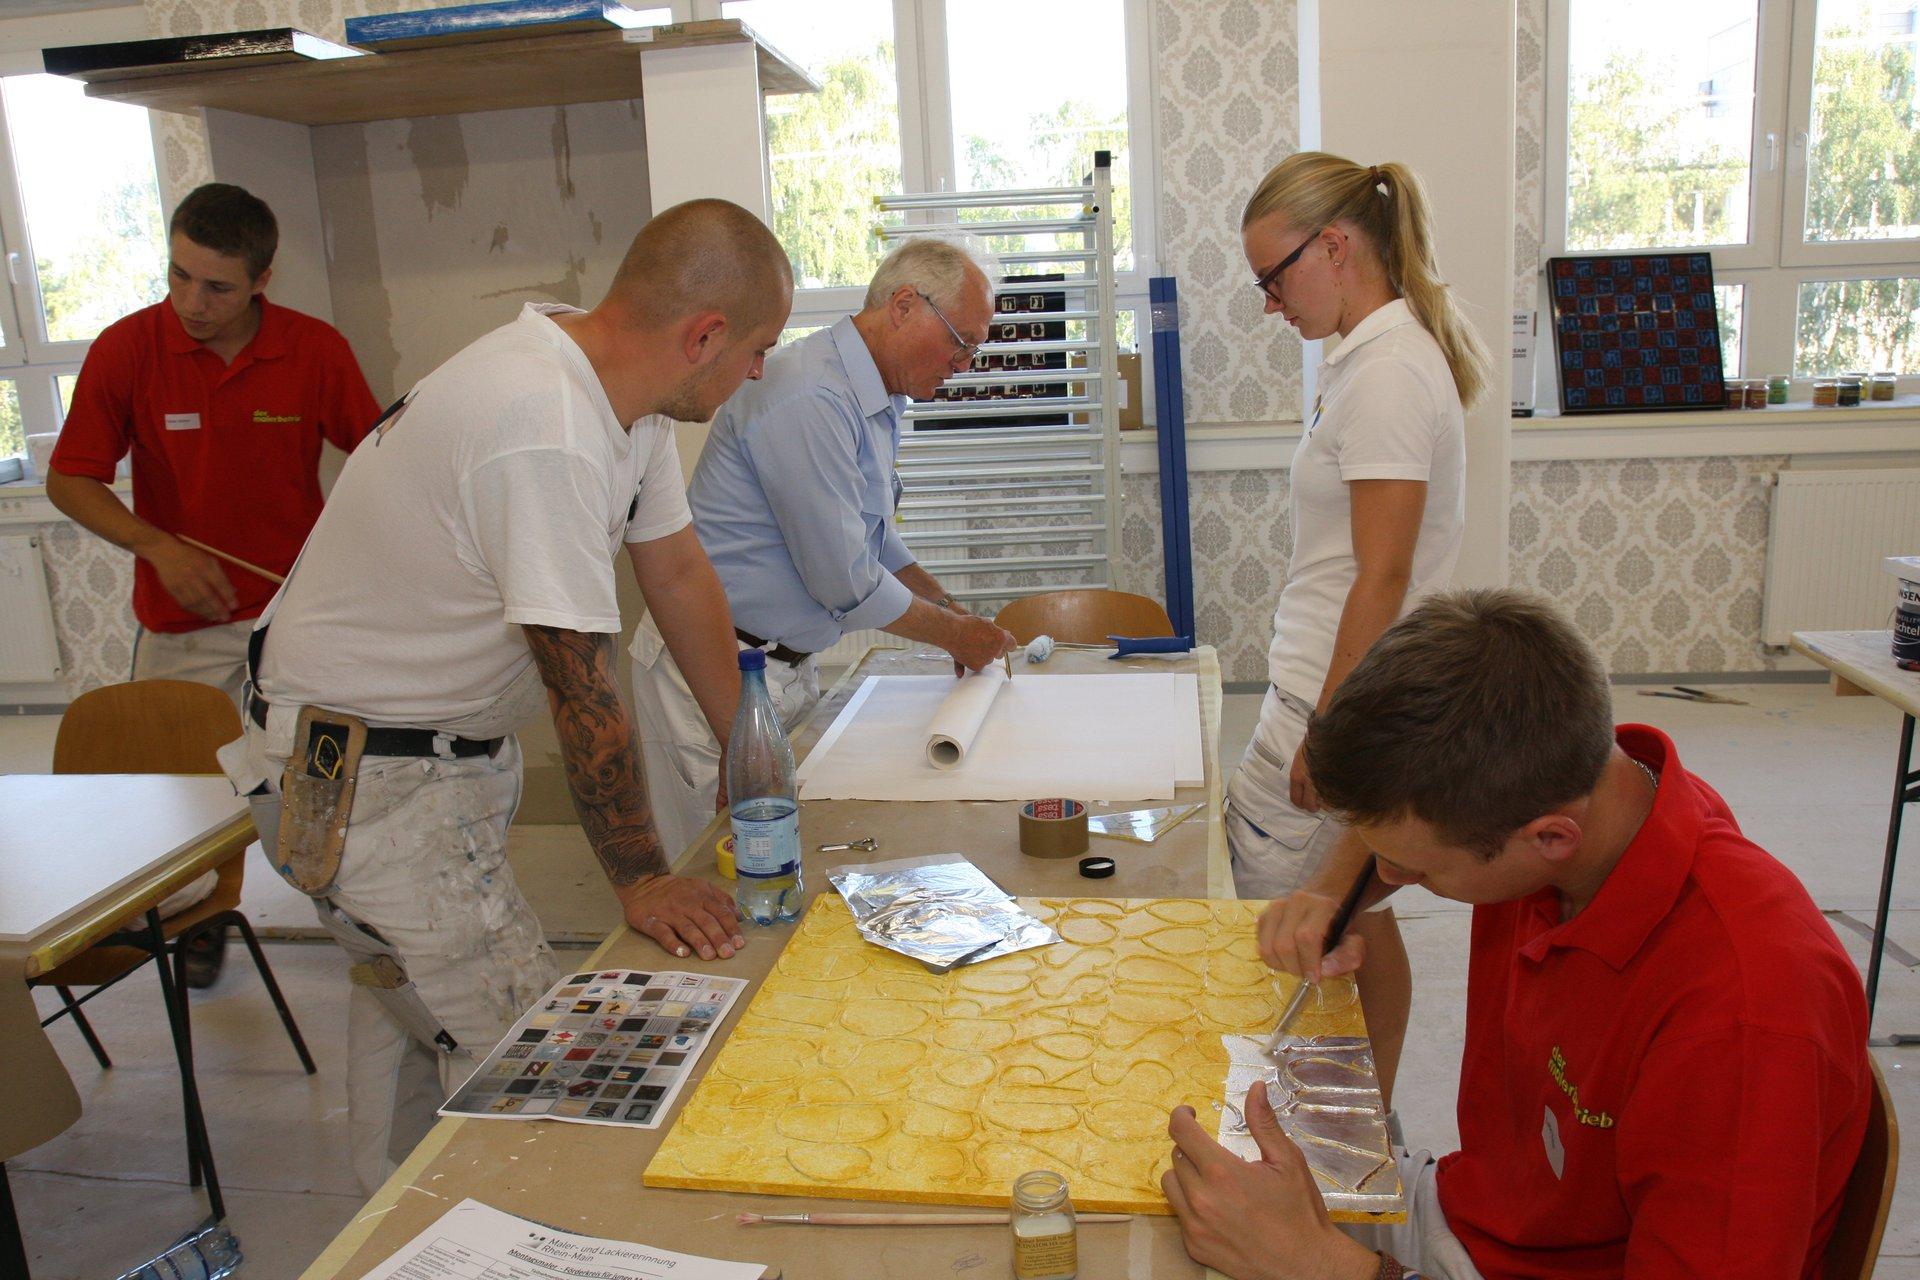 frankfurter handwerksstiftung f rdert junge maler und lackierer malerportal. Black Bedroom Furniture Sets. Home Design Ideas